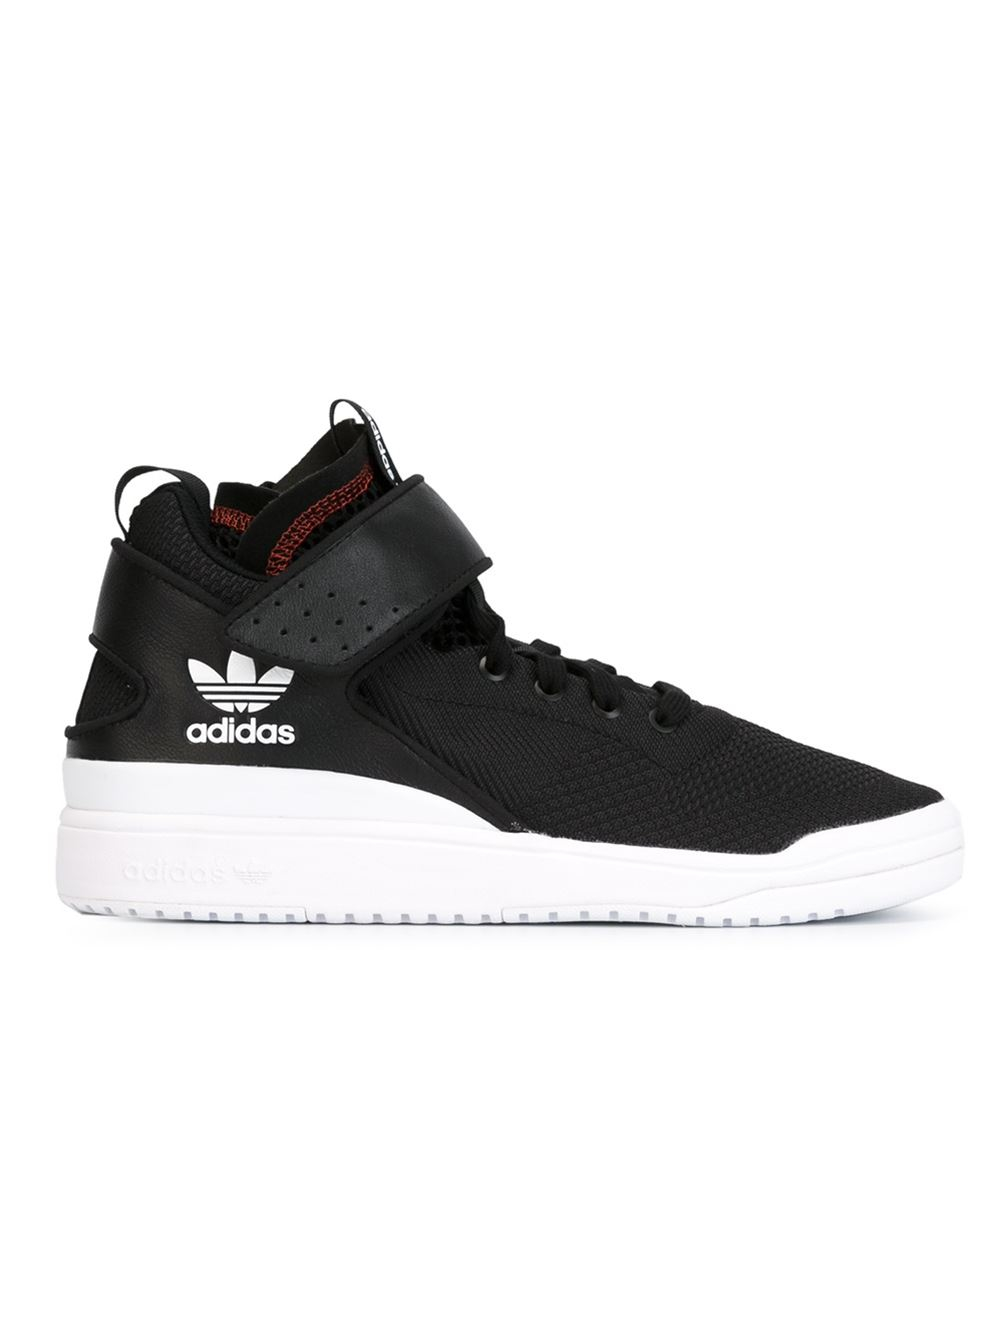 Adidas Originals Top Ten Hi Rare Sneakers New Brown: Adidas Originals Veritas High-Top Sneakers In Black For